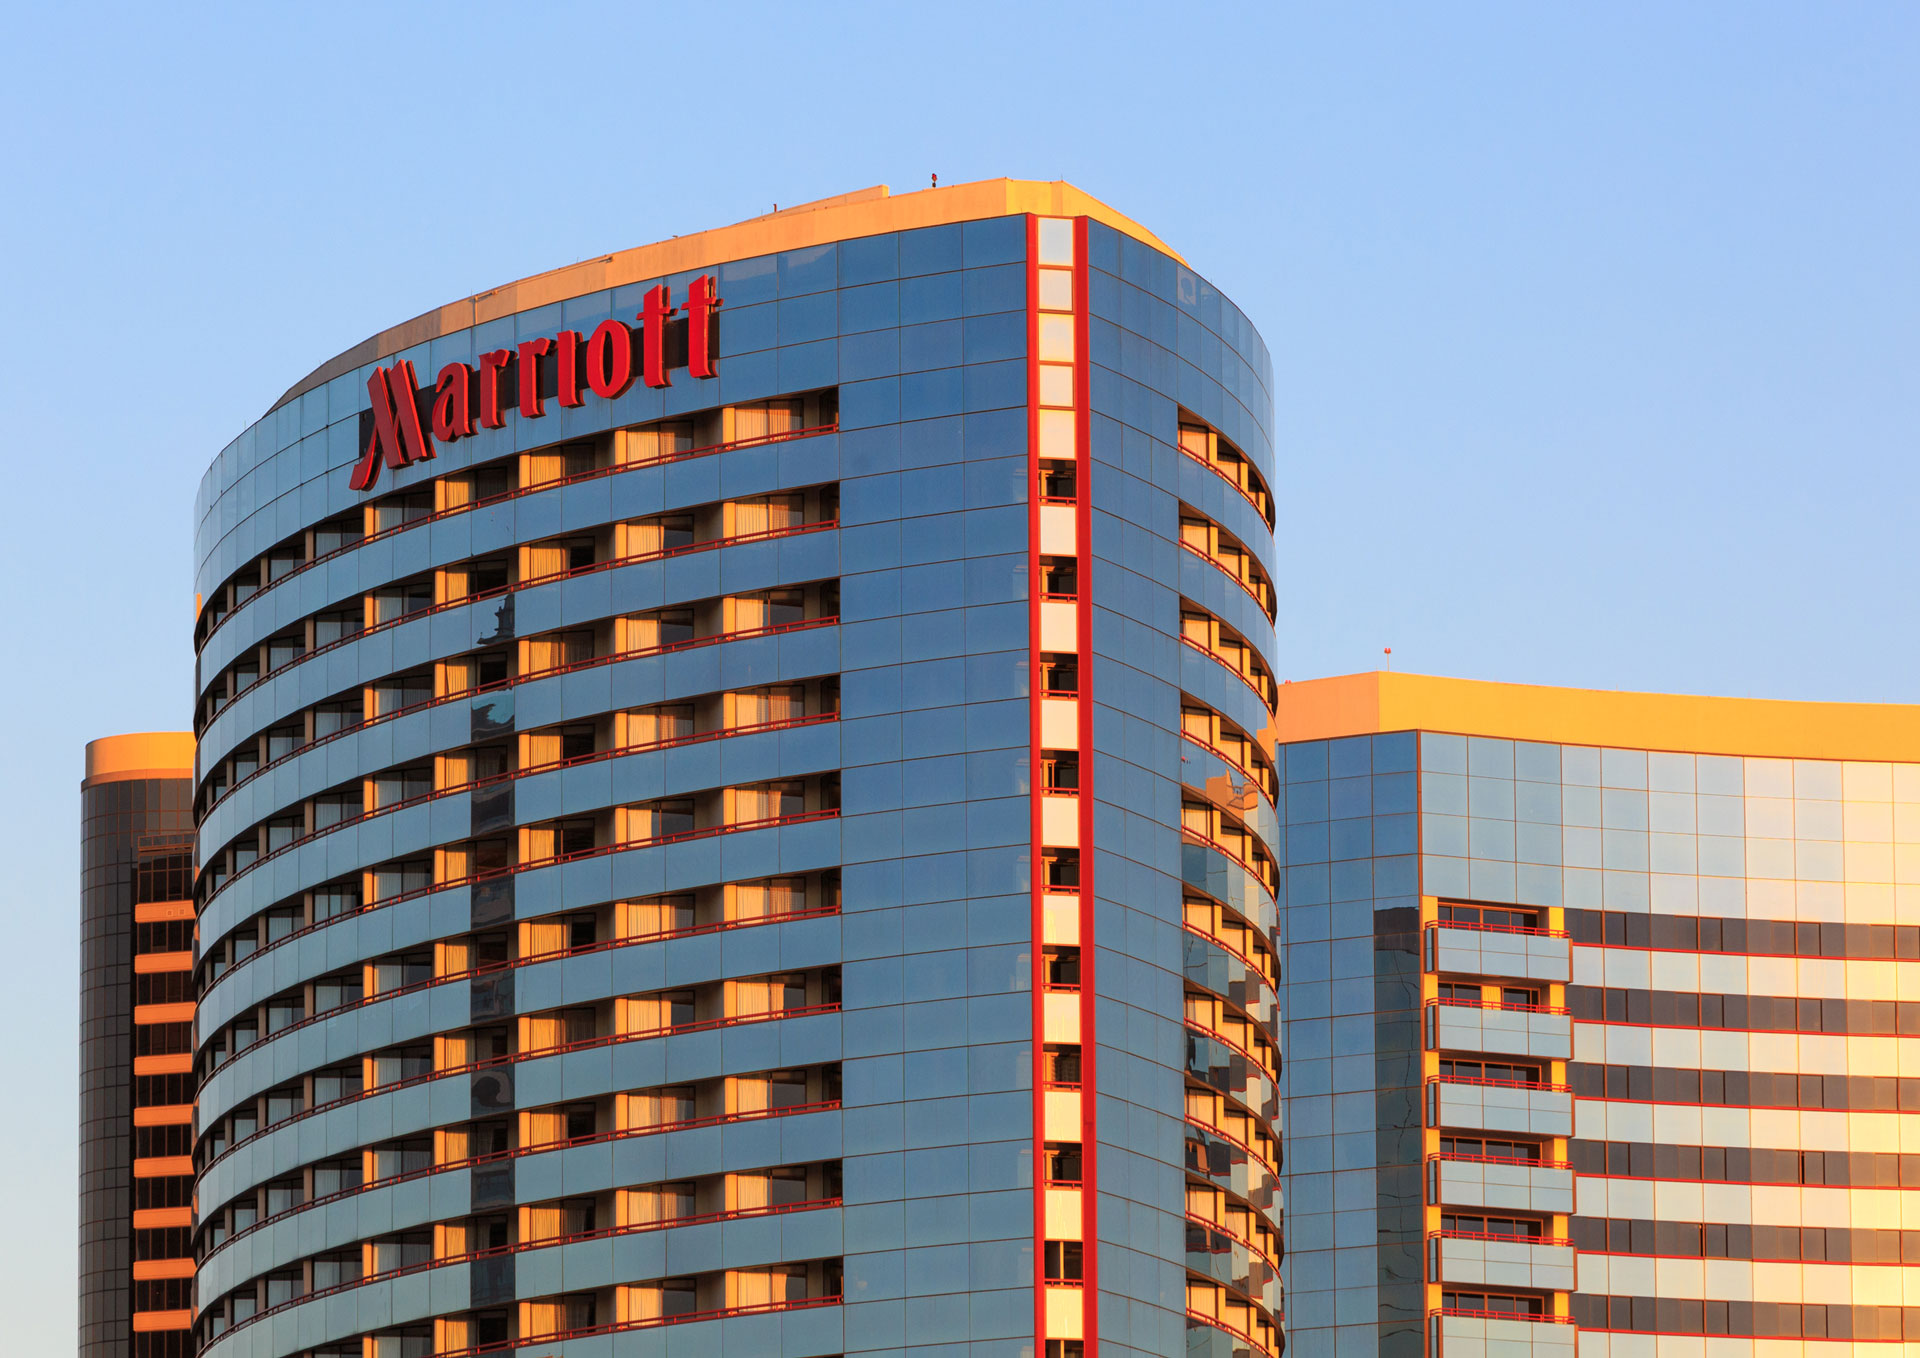 Marriott faces £99m fine for Starwood data breach